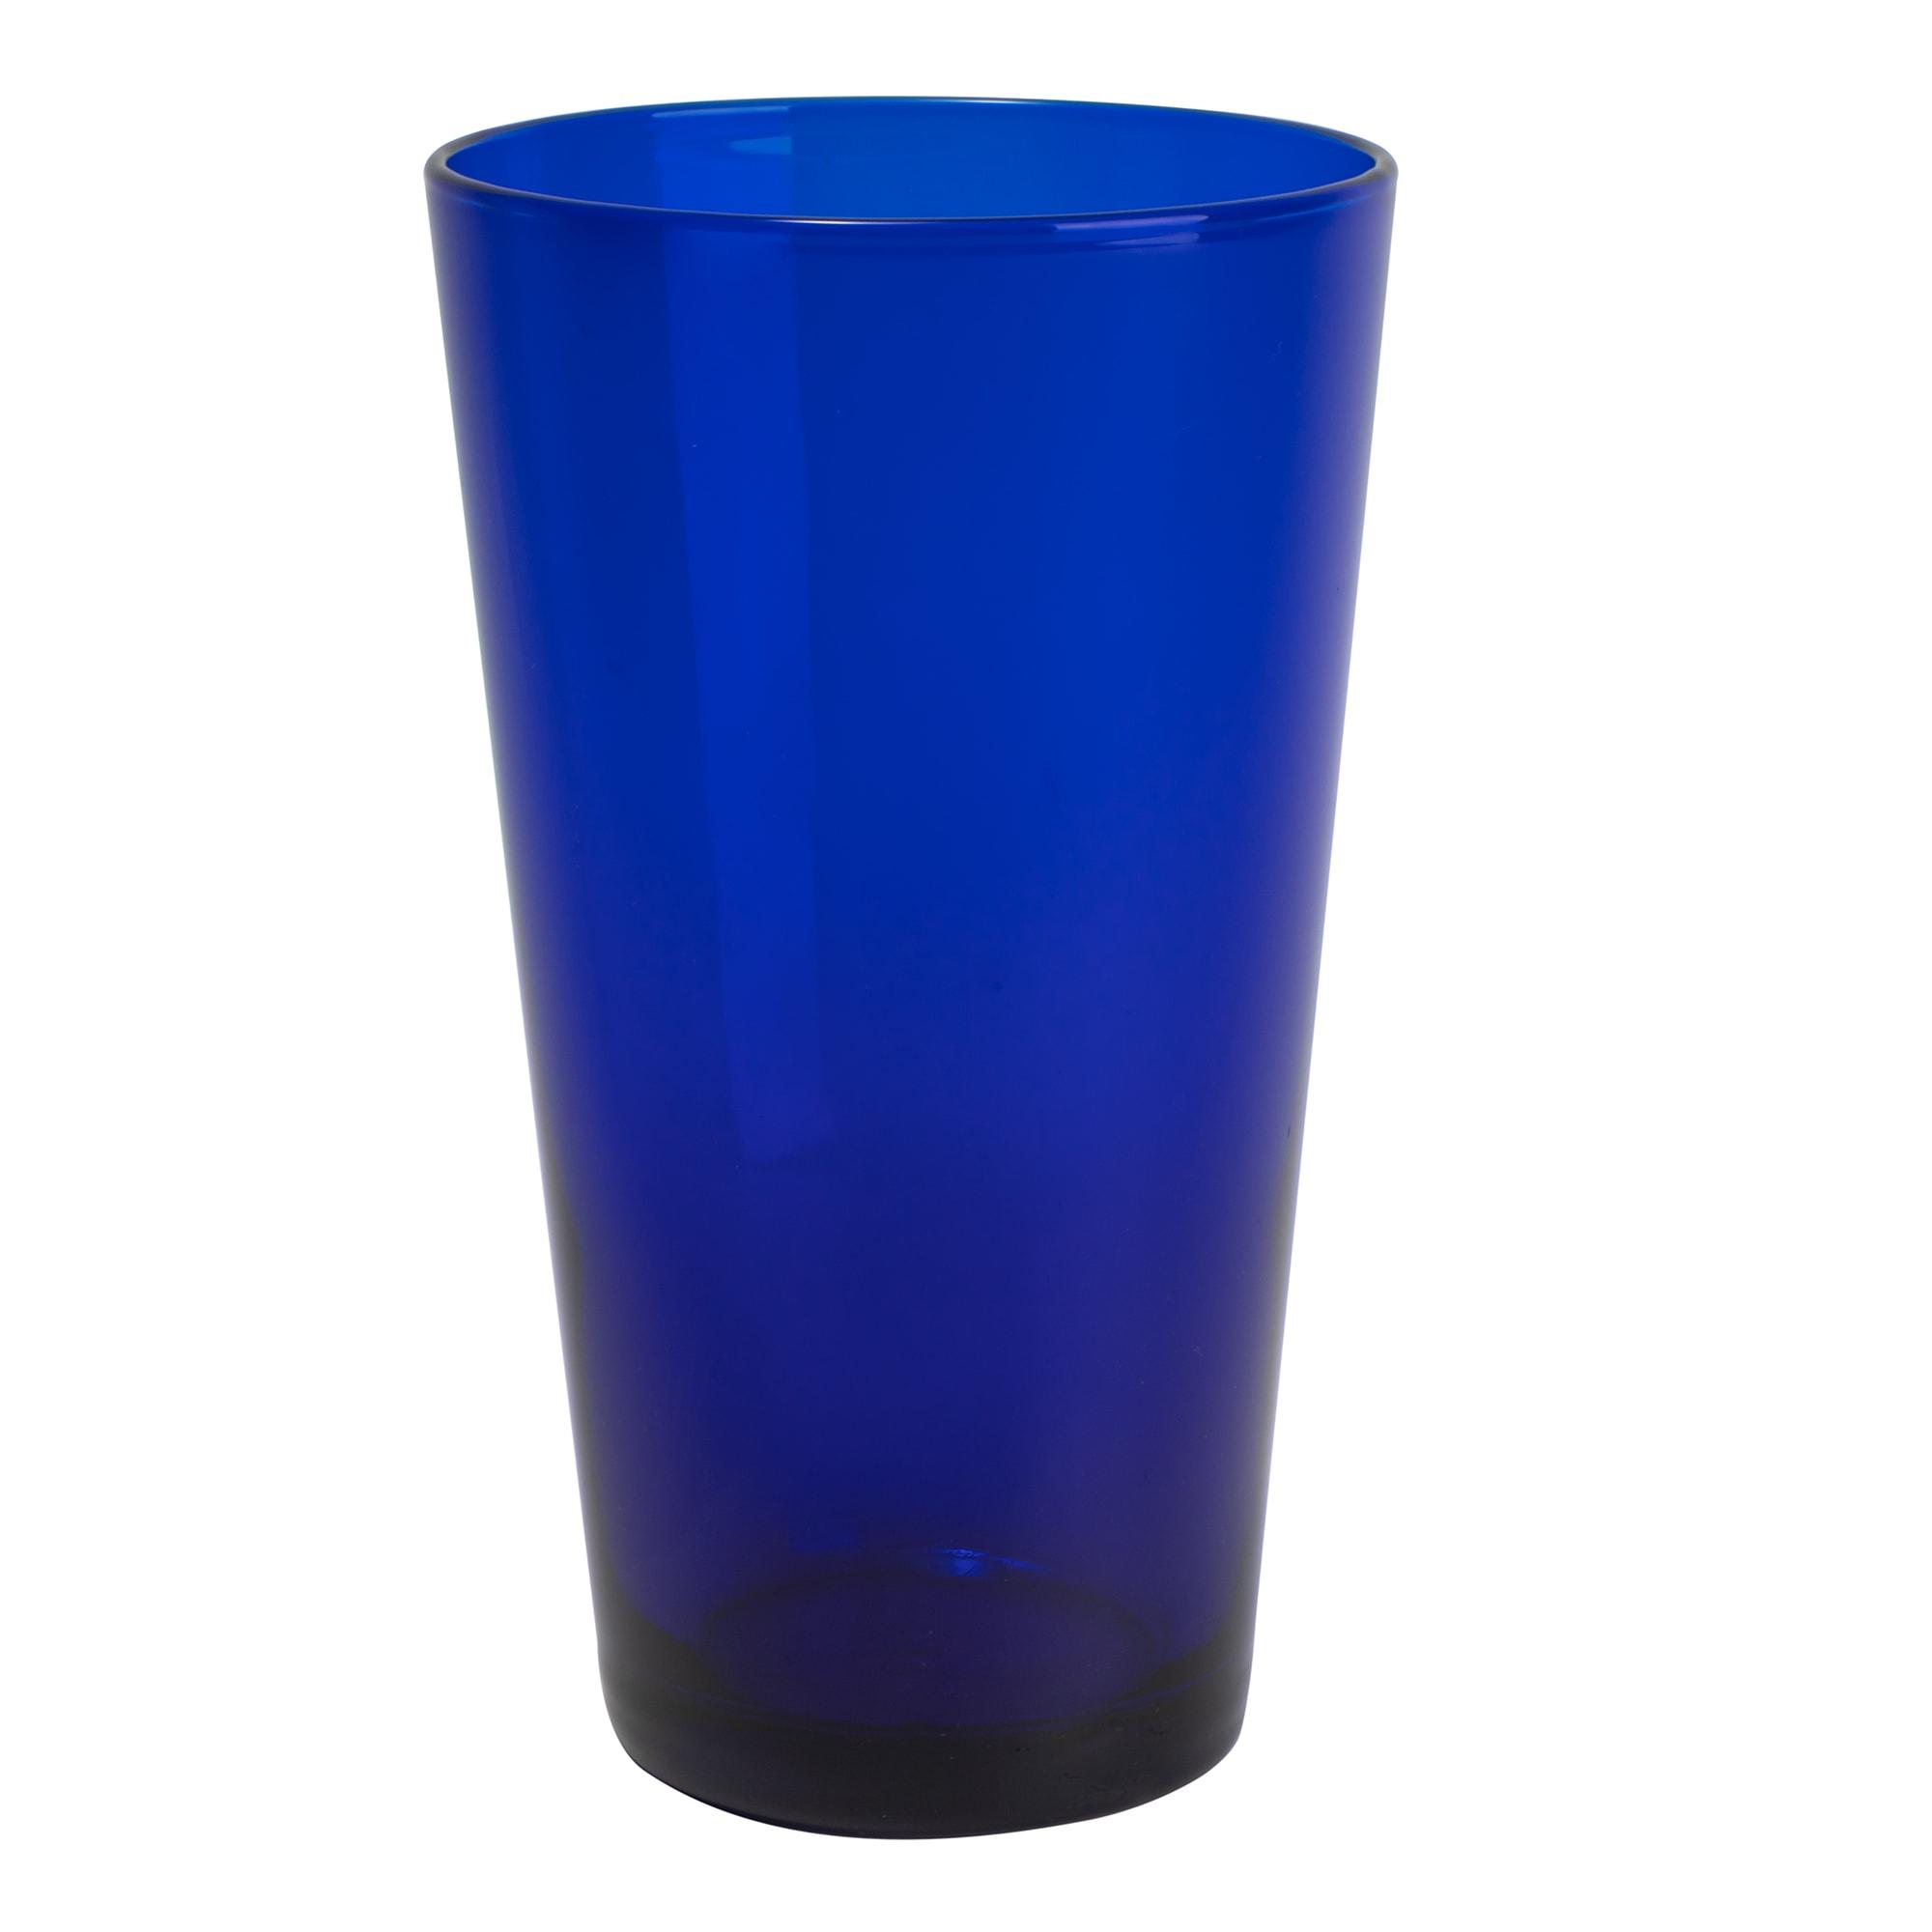 Libbey 171B 17.25-oz Flared Cobalt Cooler Glass